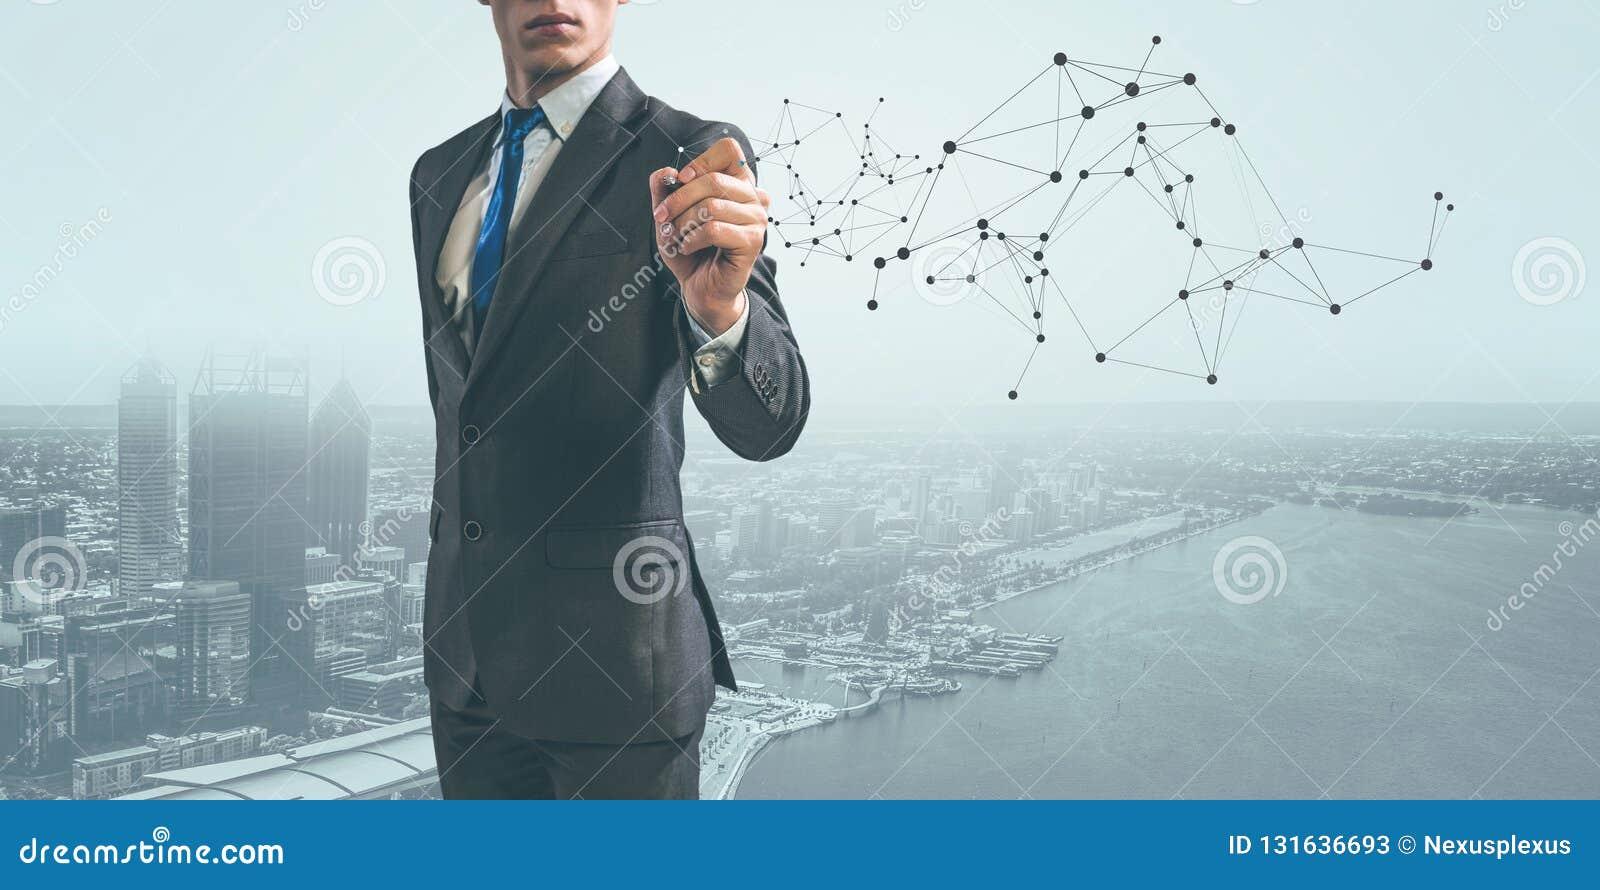 Moderne technologieën voor zaken Gemengde media